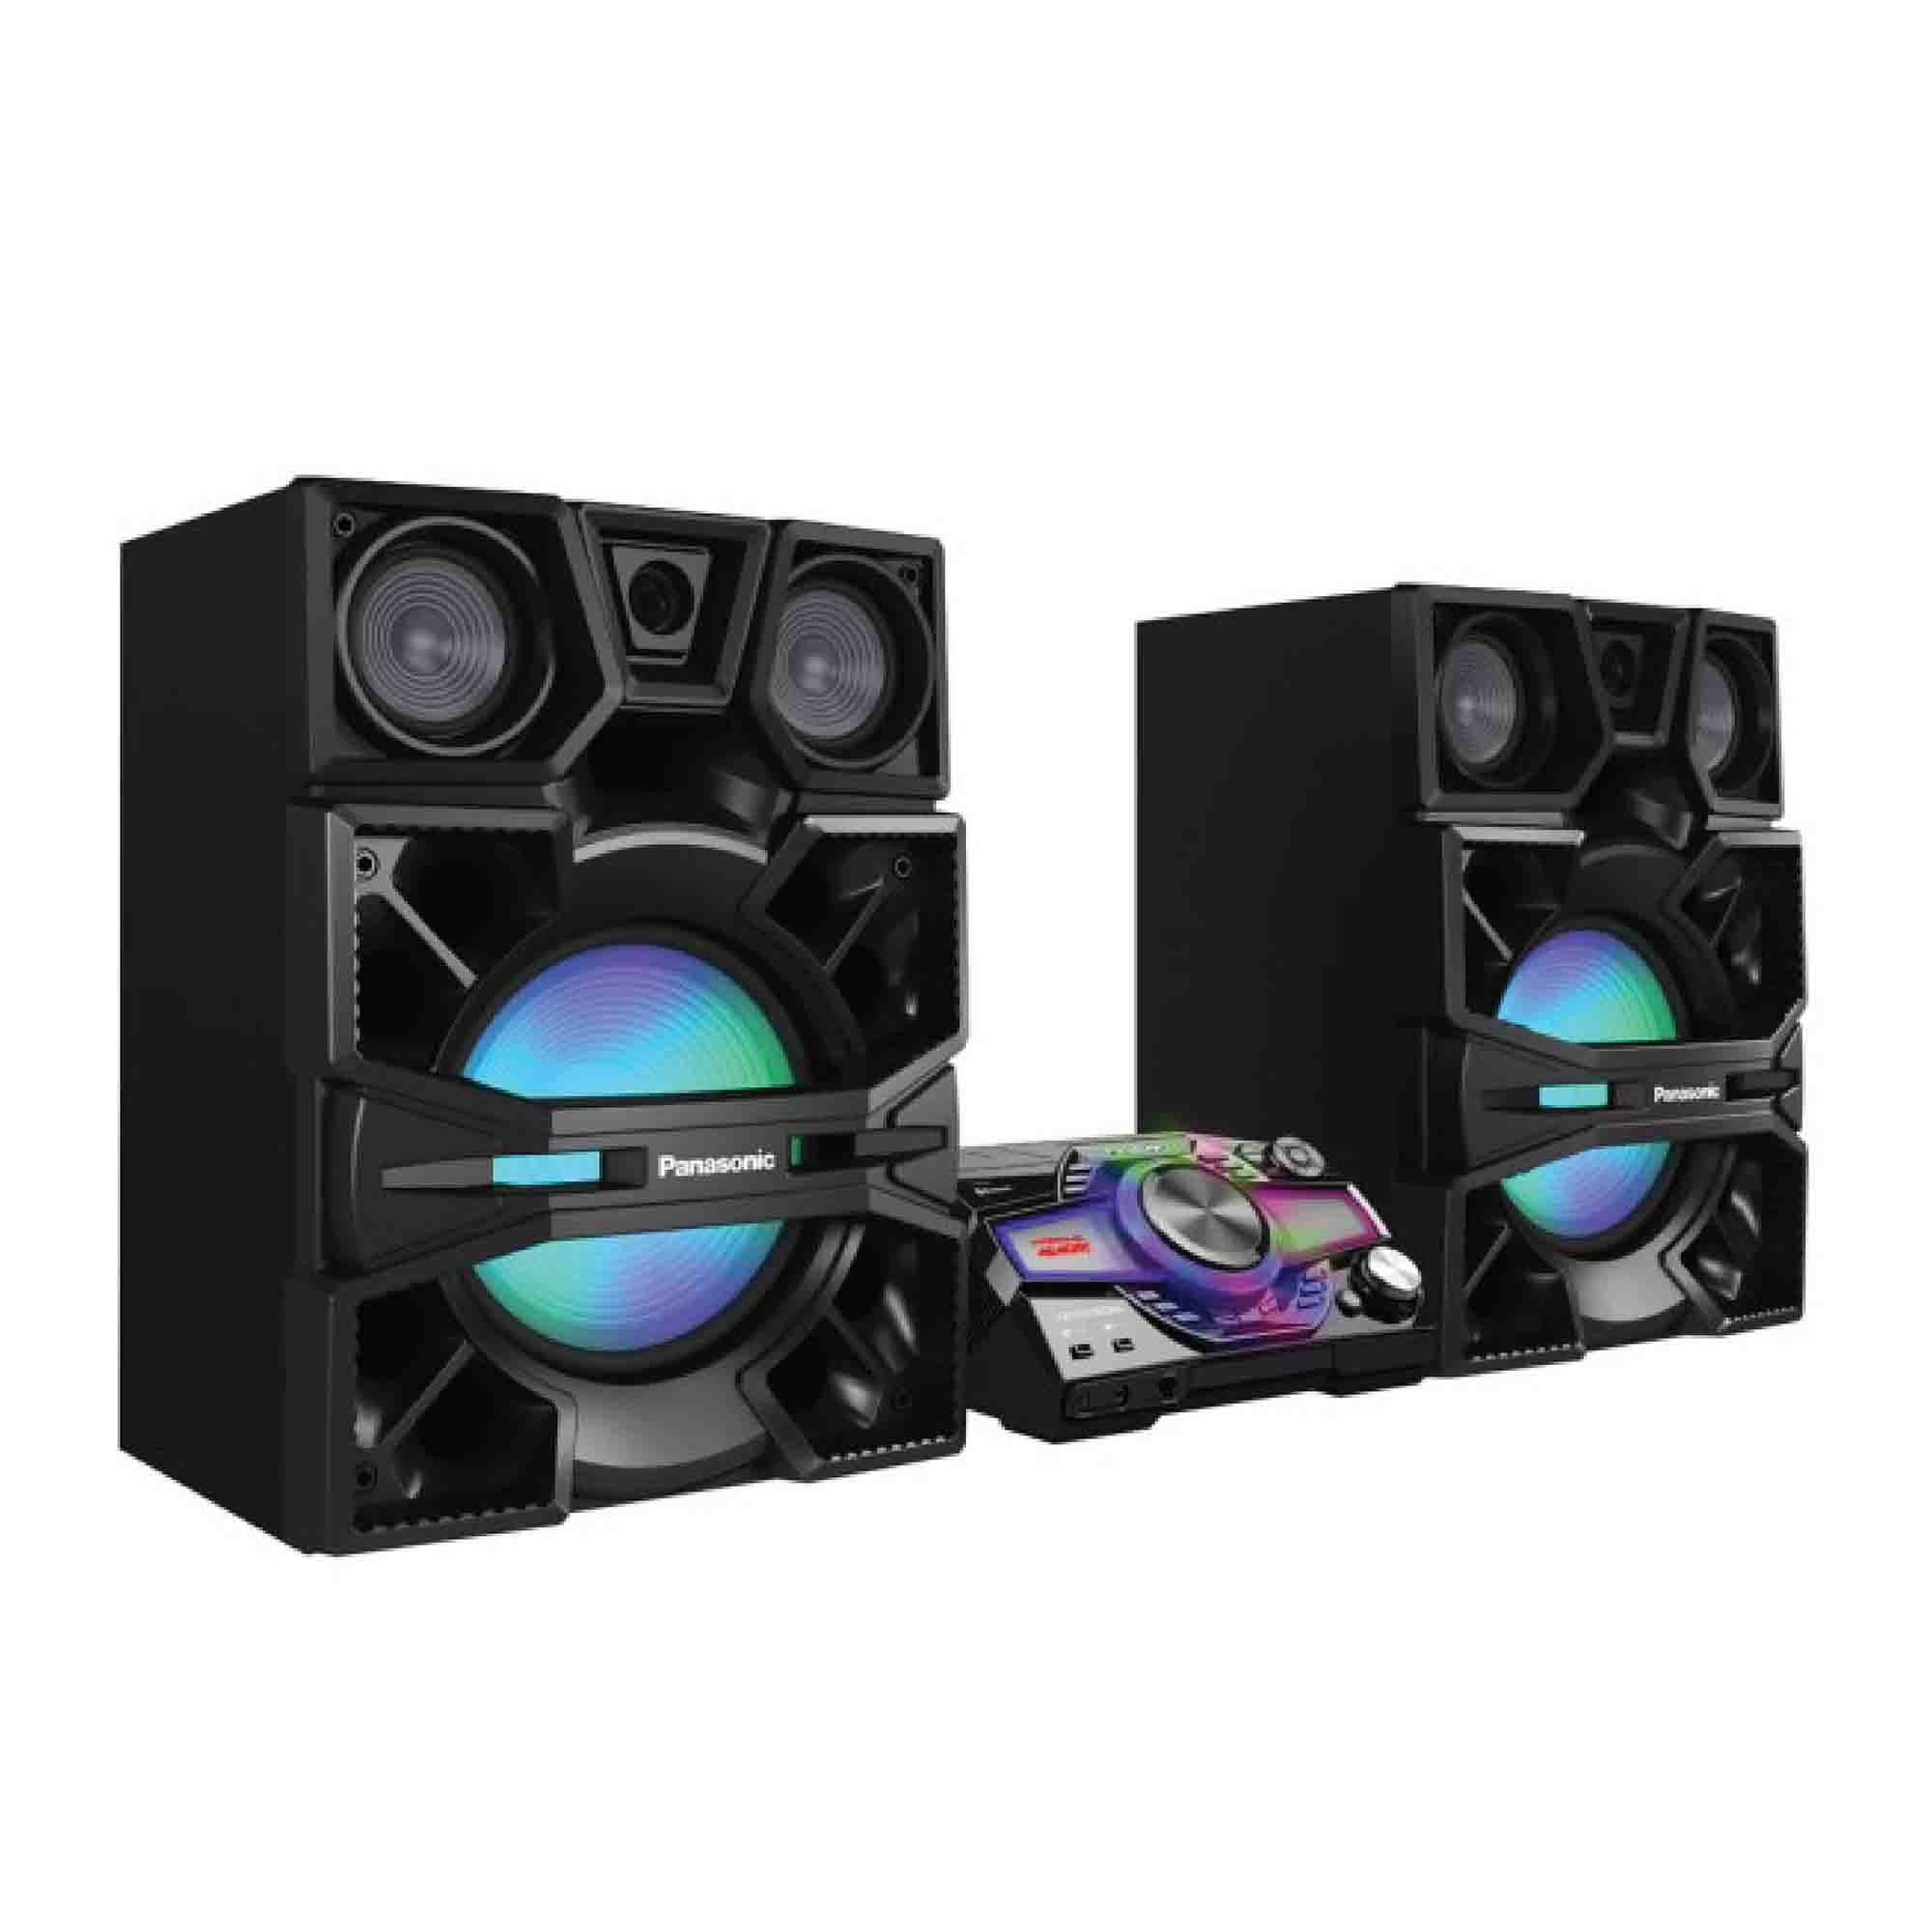 Panasonic Mini Hifi Sound System Sc End 1 16 2021 1200 Am Hi Fi Pc Speaker Max9000 4000w 38cm Super Woofer